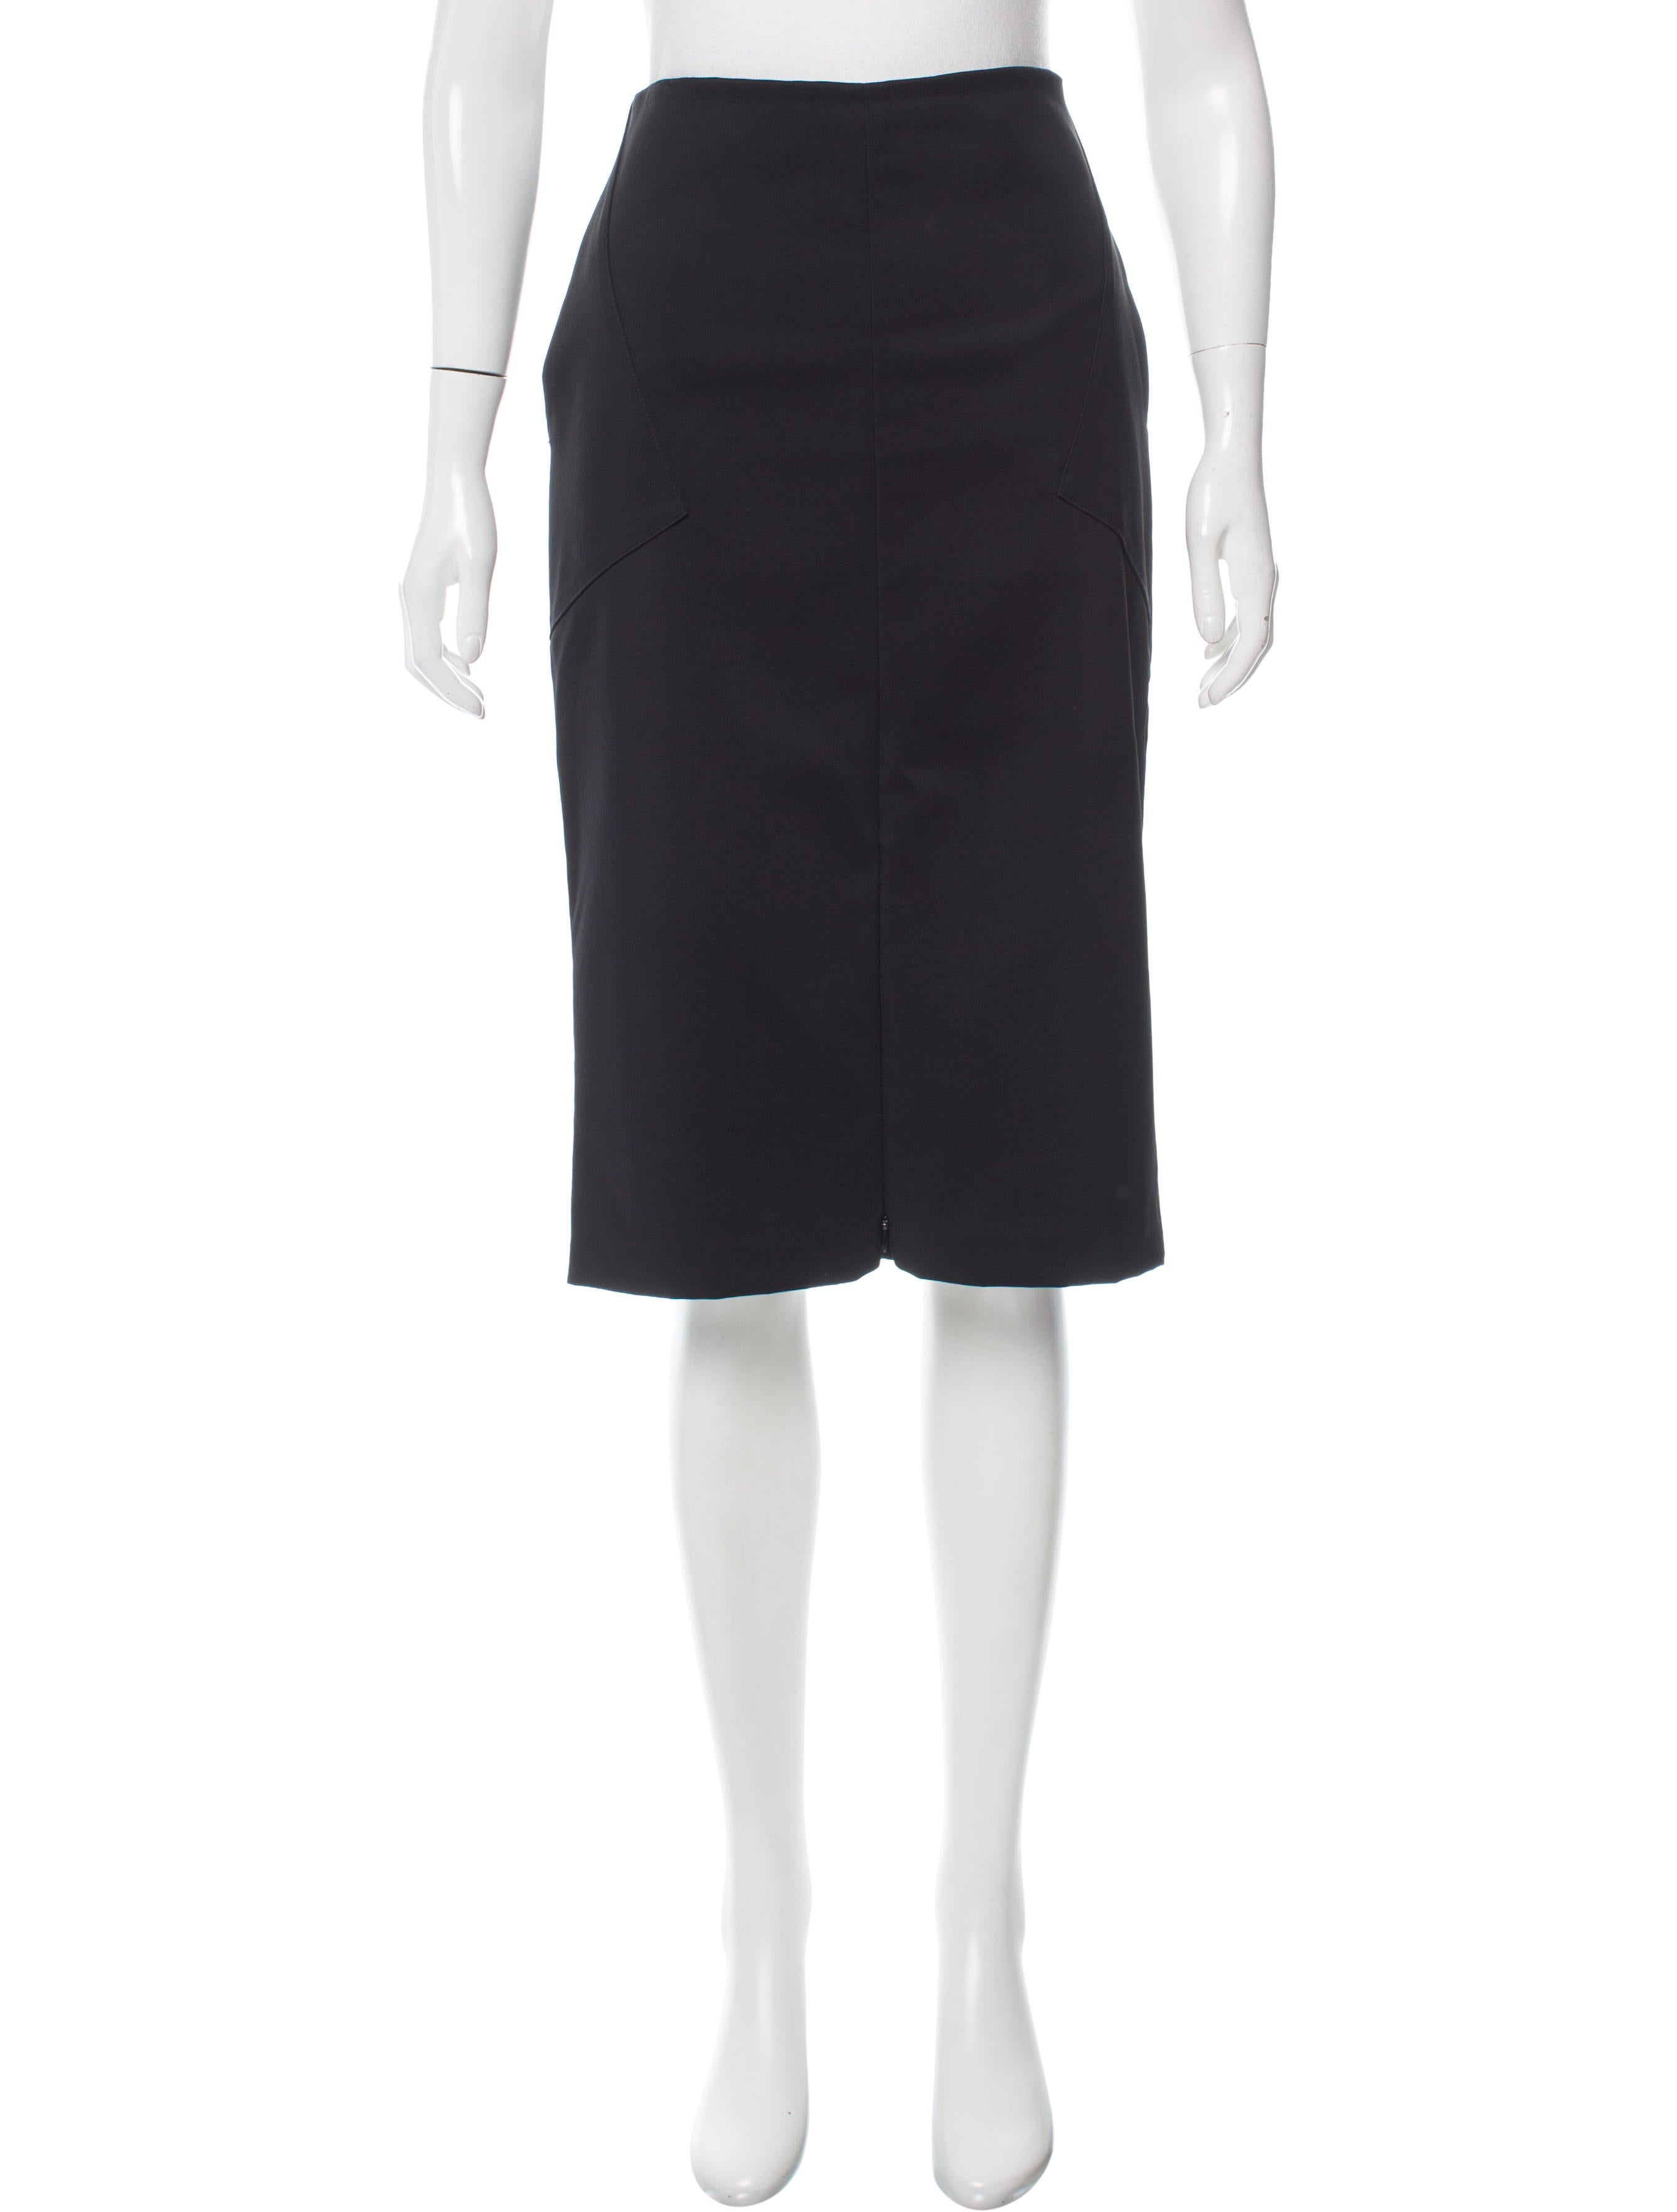 Protagonist Knee-Length Pencil Skirt - Clothing